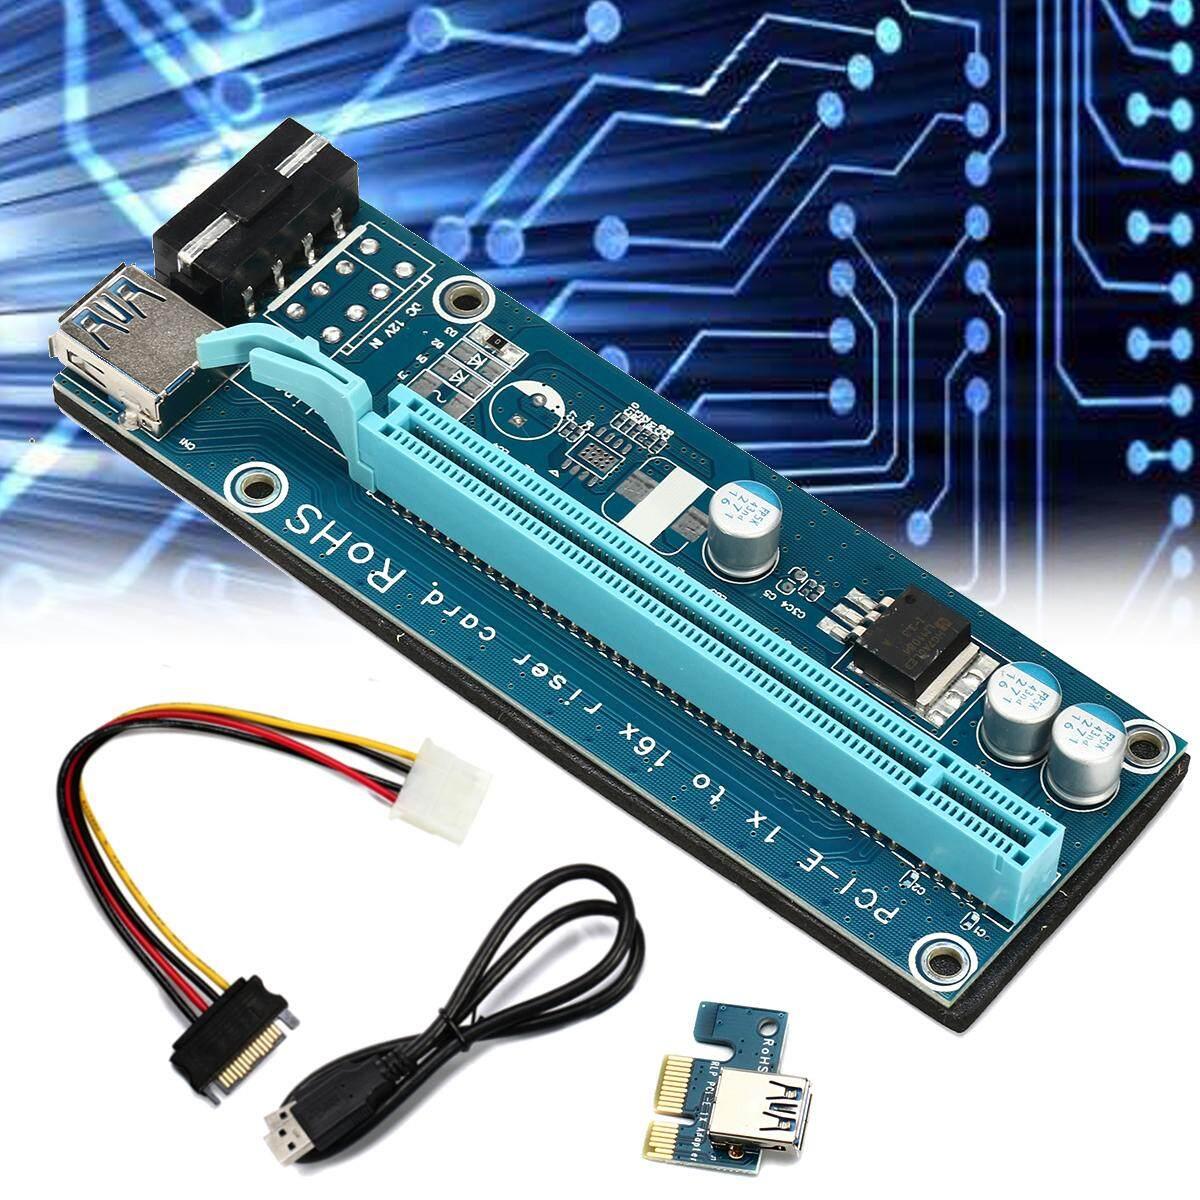 2 set 4pcs/set PCIE PCI-E Express 1x To 16x Extender Riser Card Adapter 15Pin Power USB 3.0